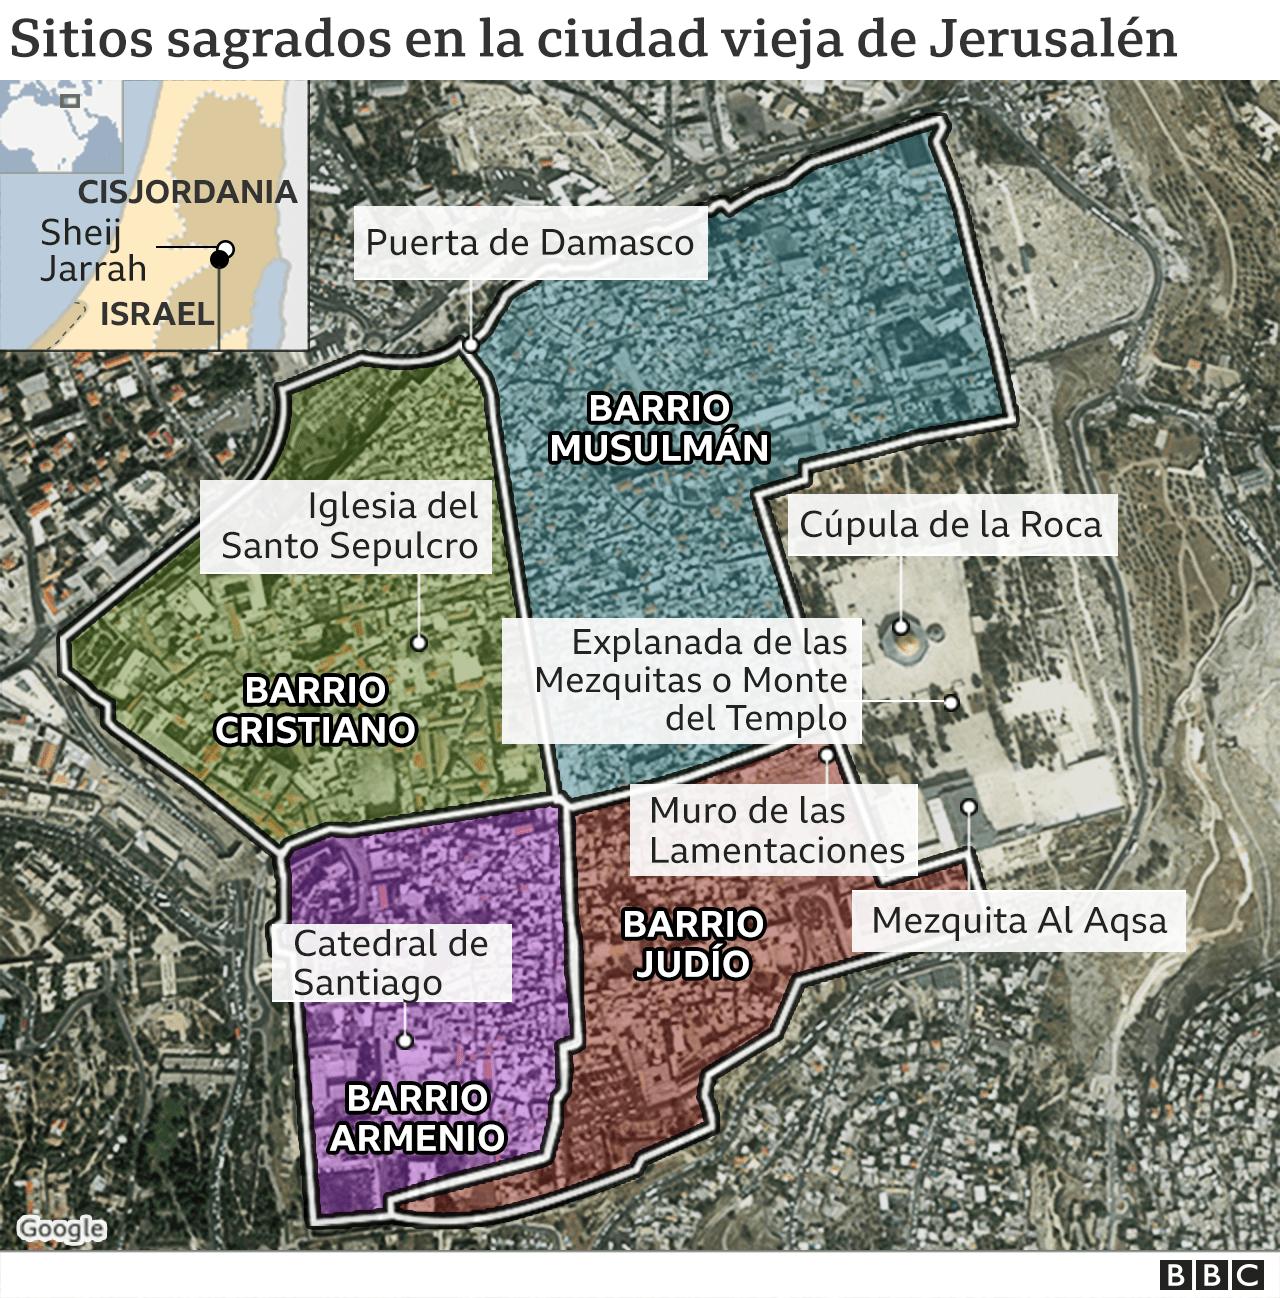 Ciudad vieja de Jerusalén